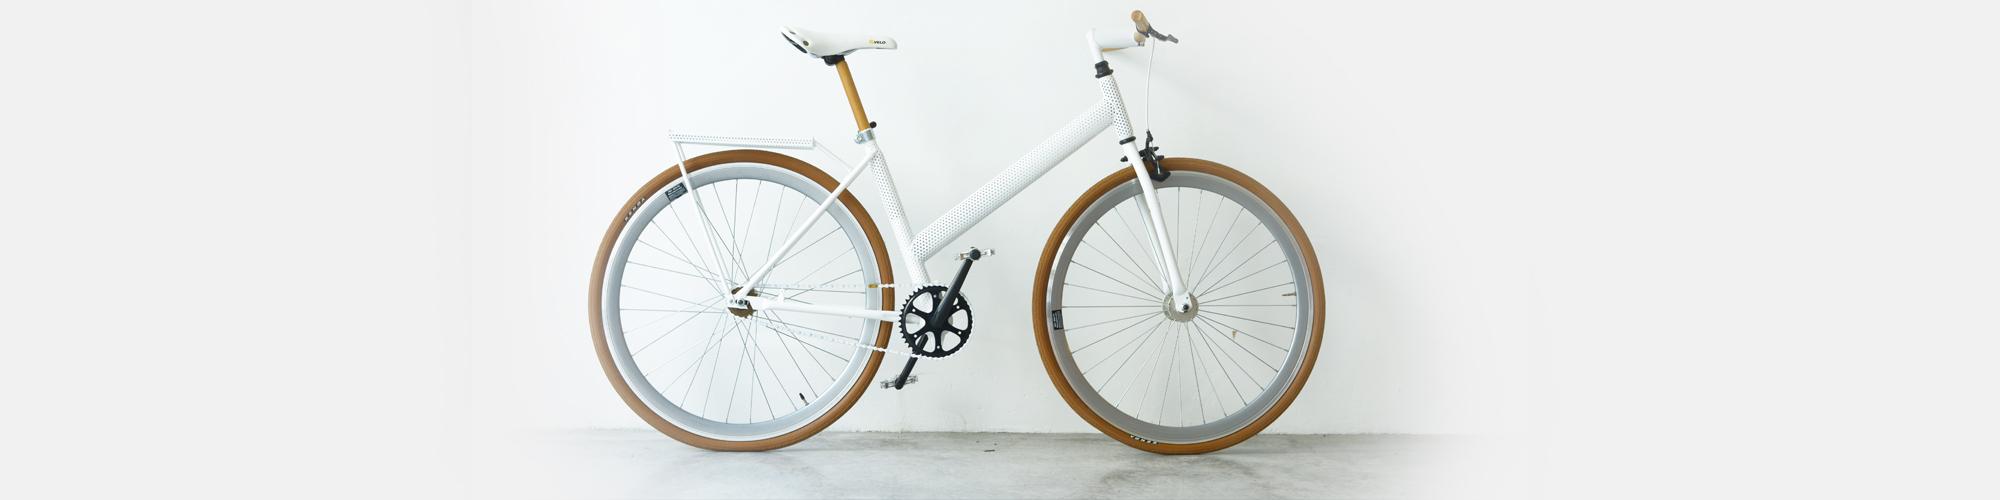 Bespoke-bike8